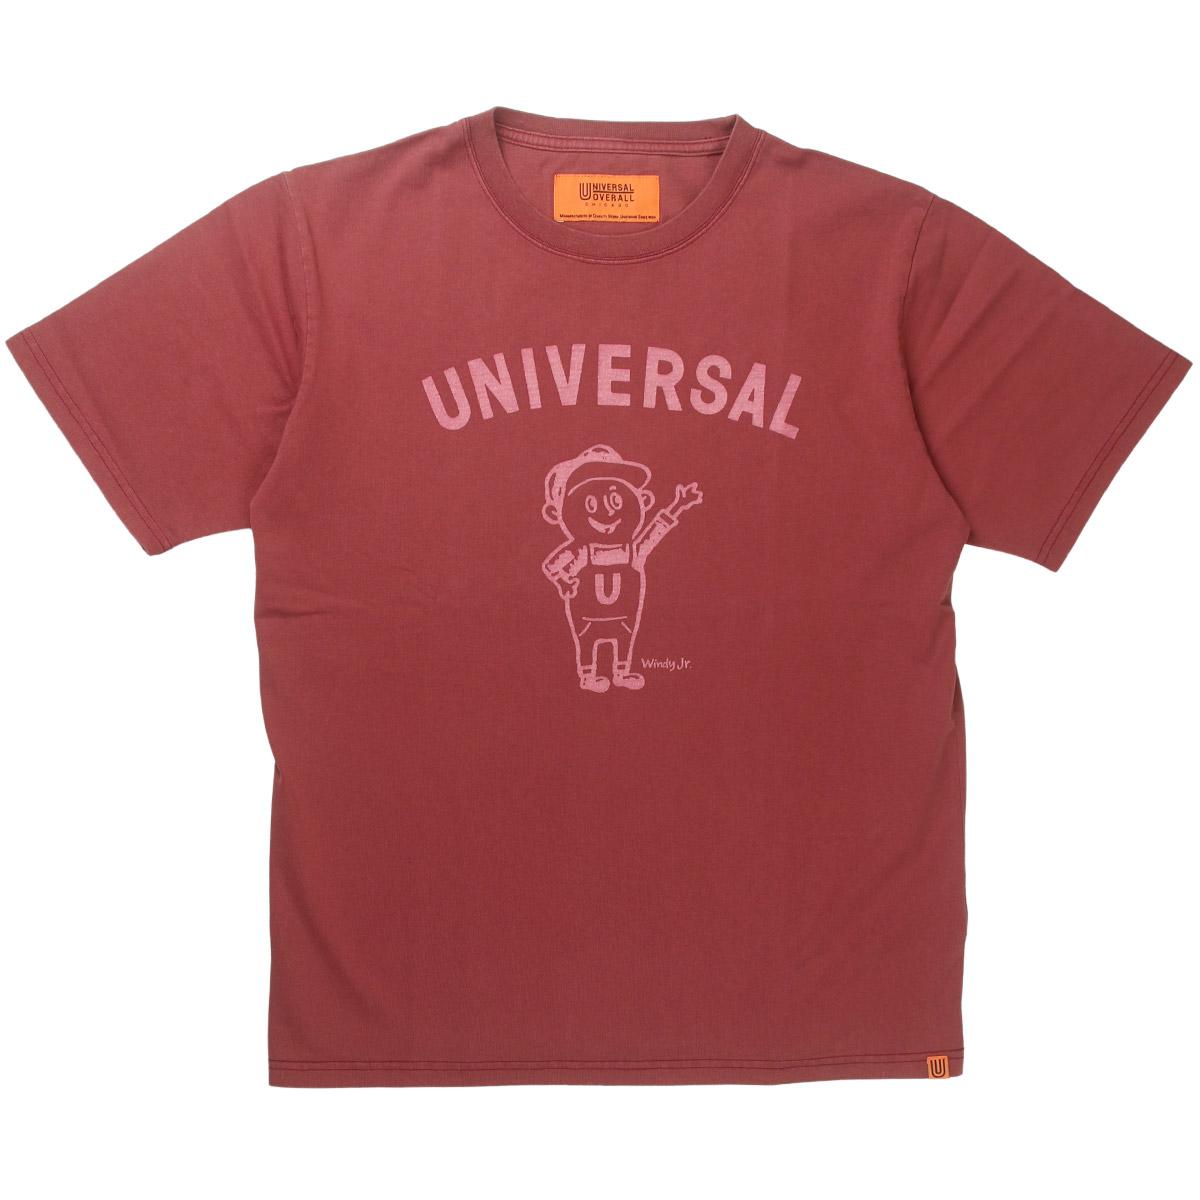 UNIVERSAL OVERALL ユニバーサルオーバーオール WINDY JR.TEE